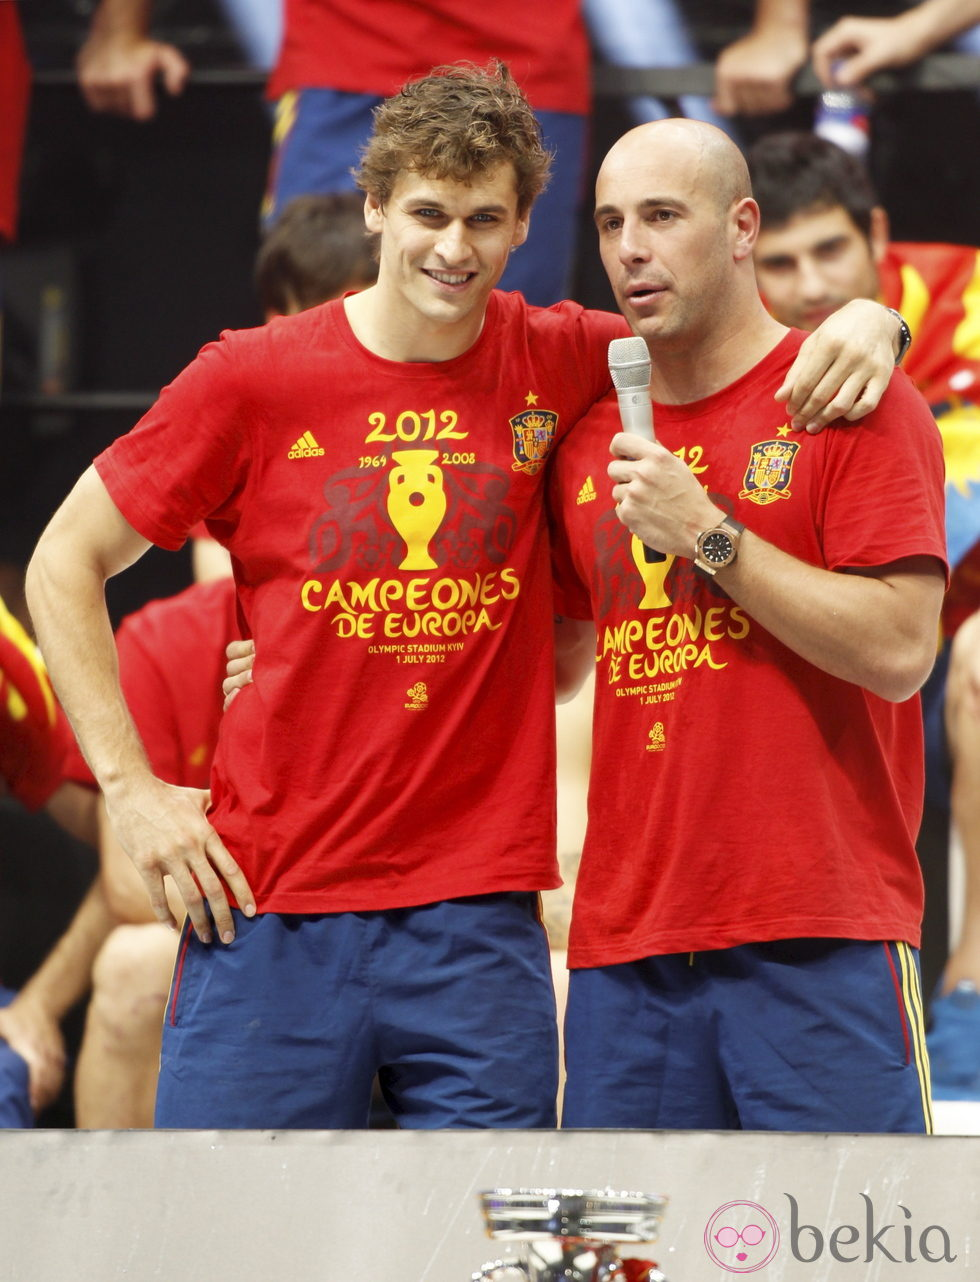 Eurocopa 2012  24353_llorente-pepe-reina-celebracion-eurocopa-2012-cibeles